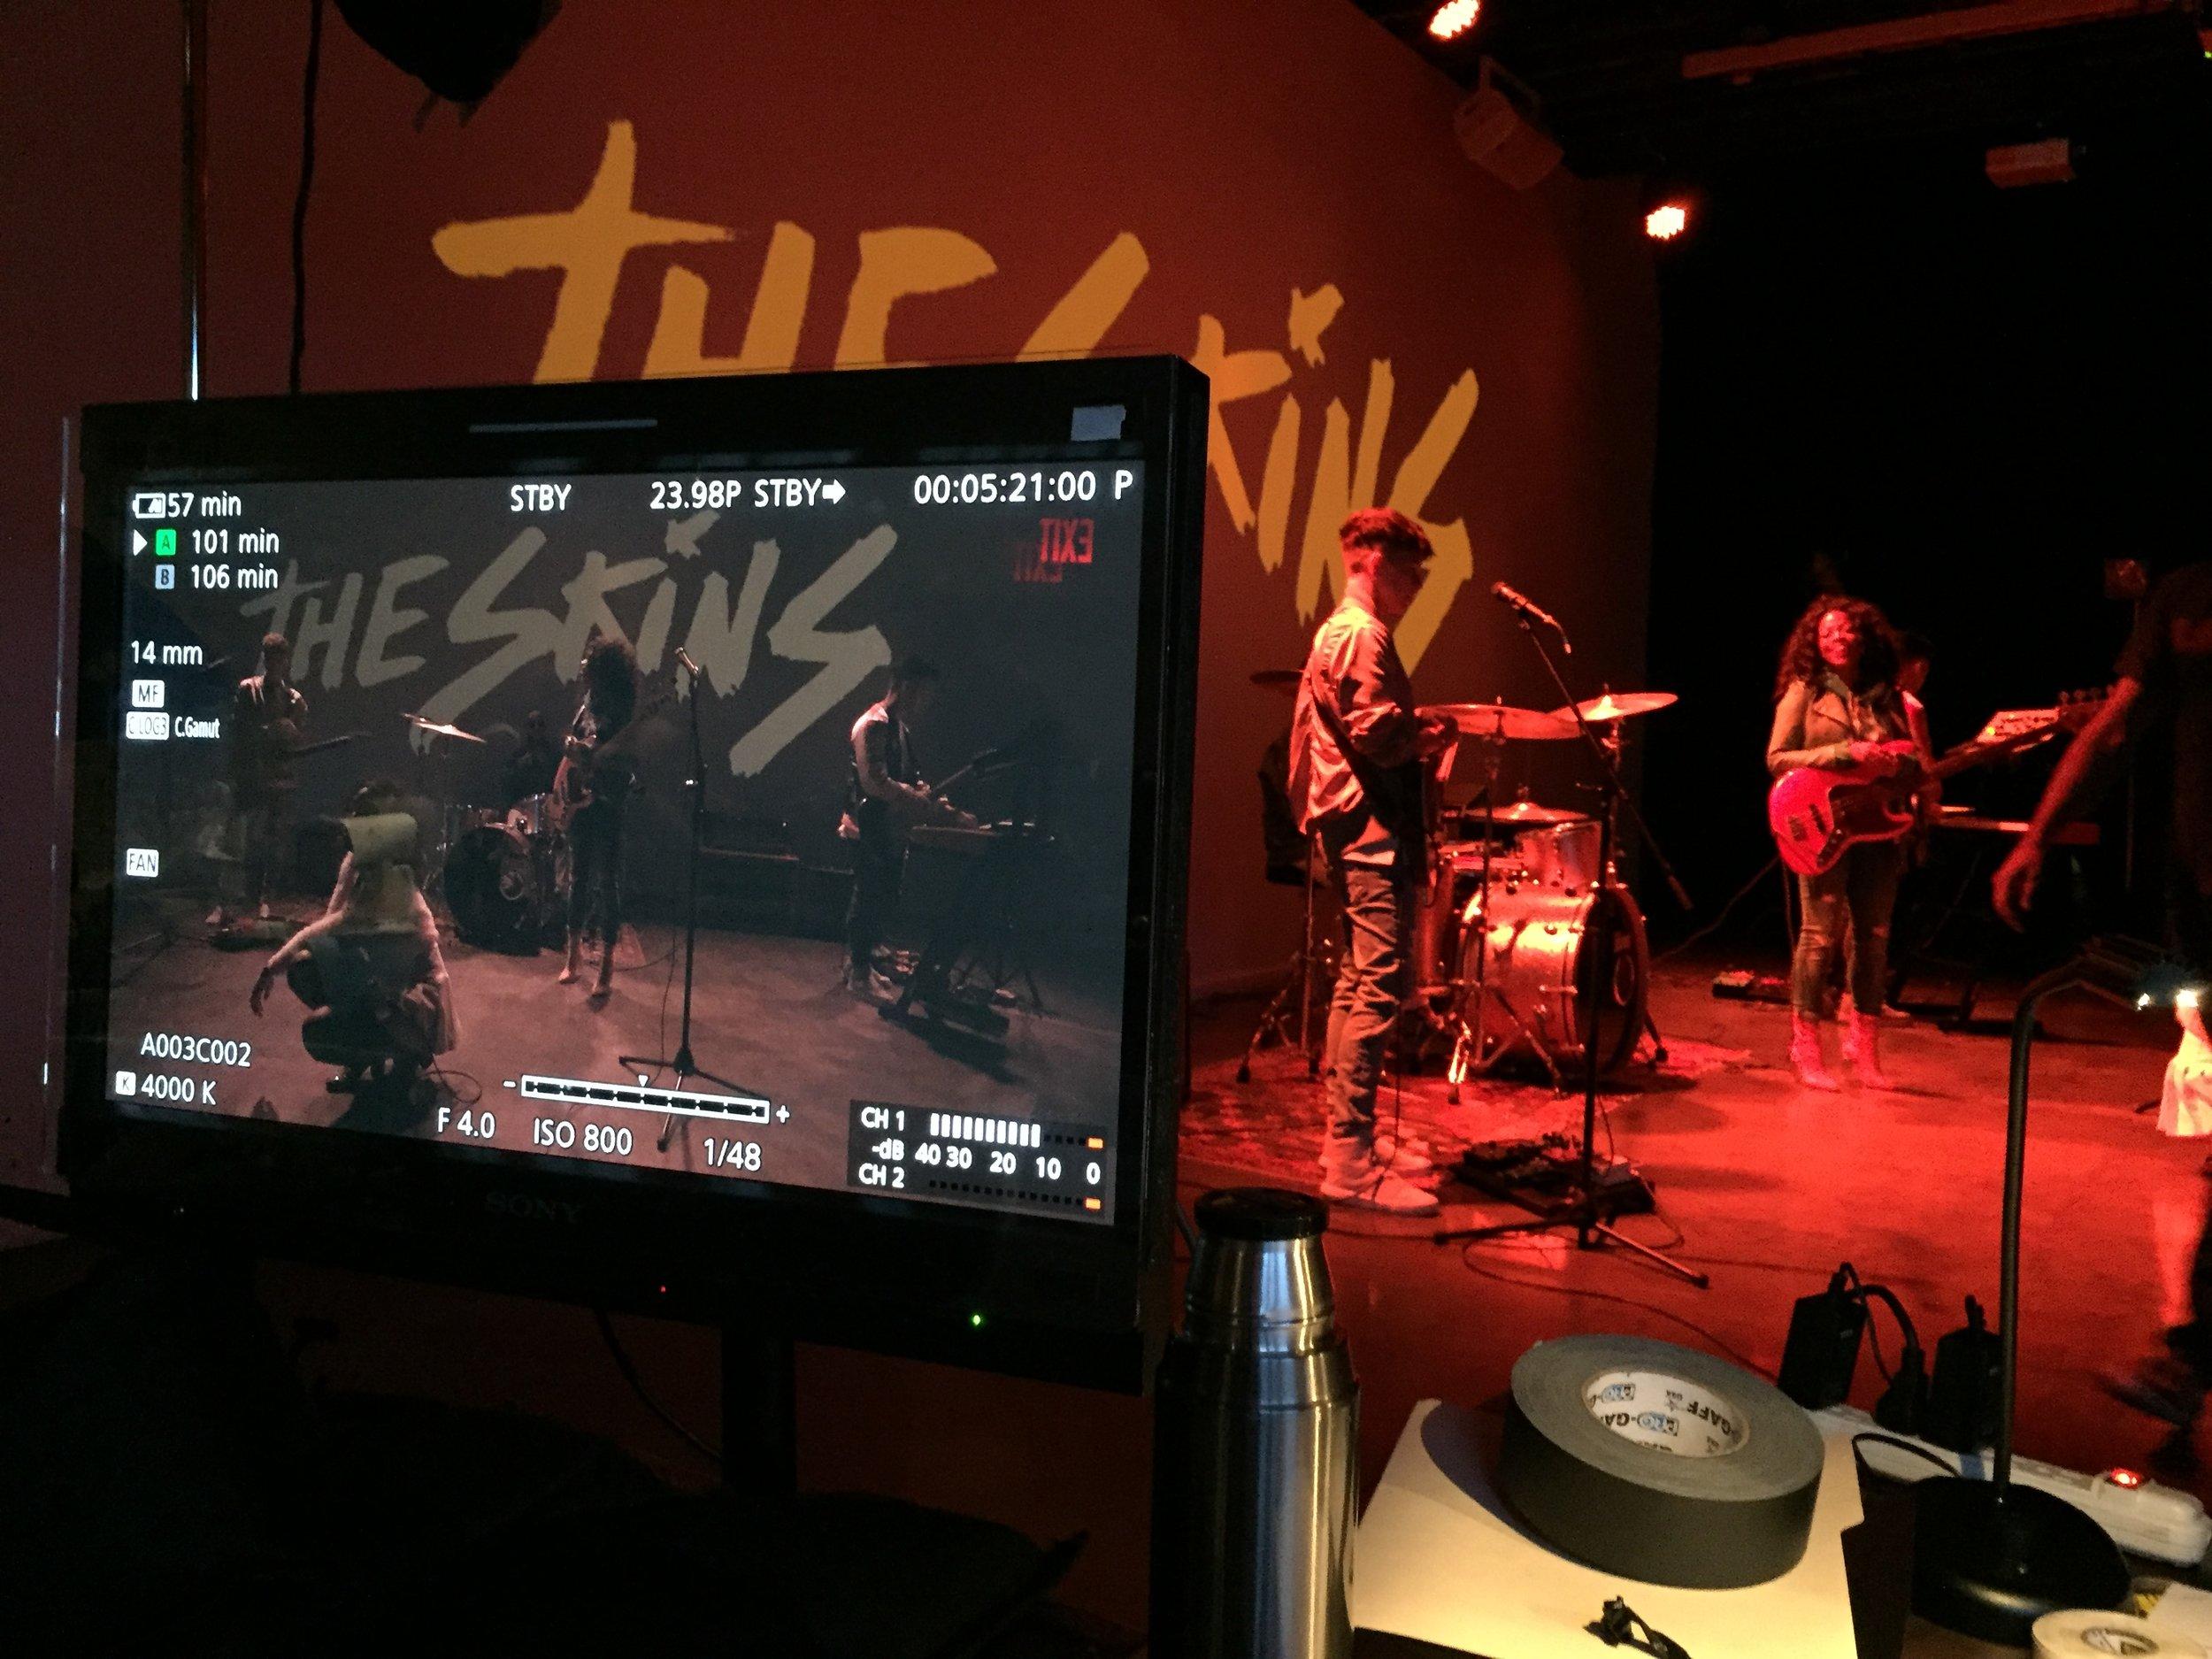 The Skins - I (LightBox Sessions)